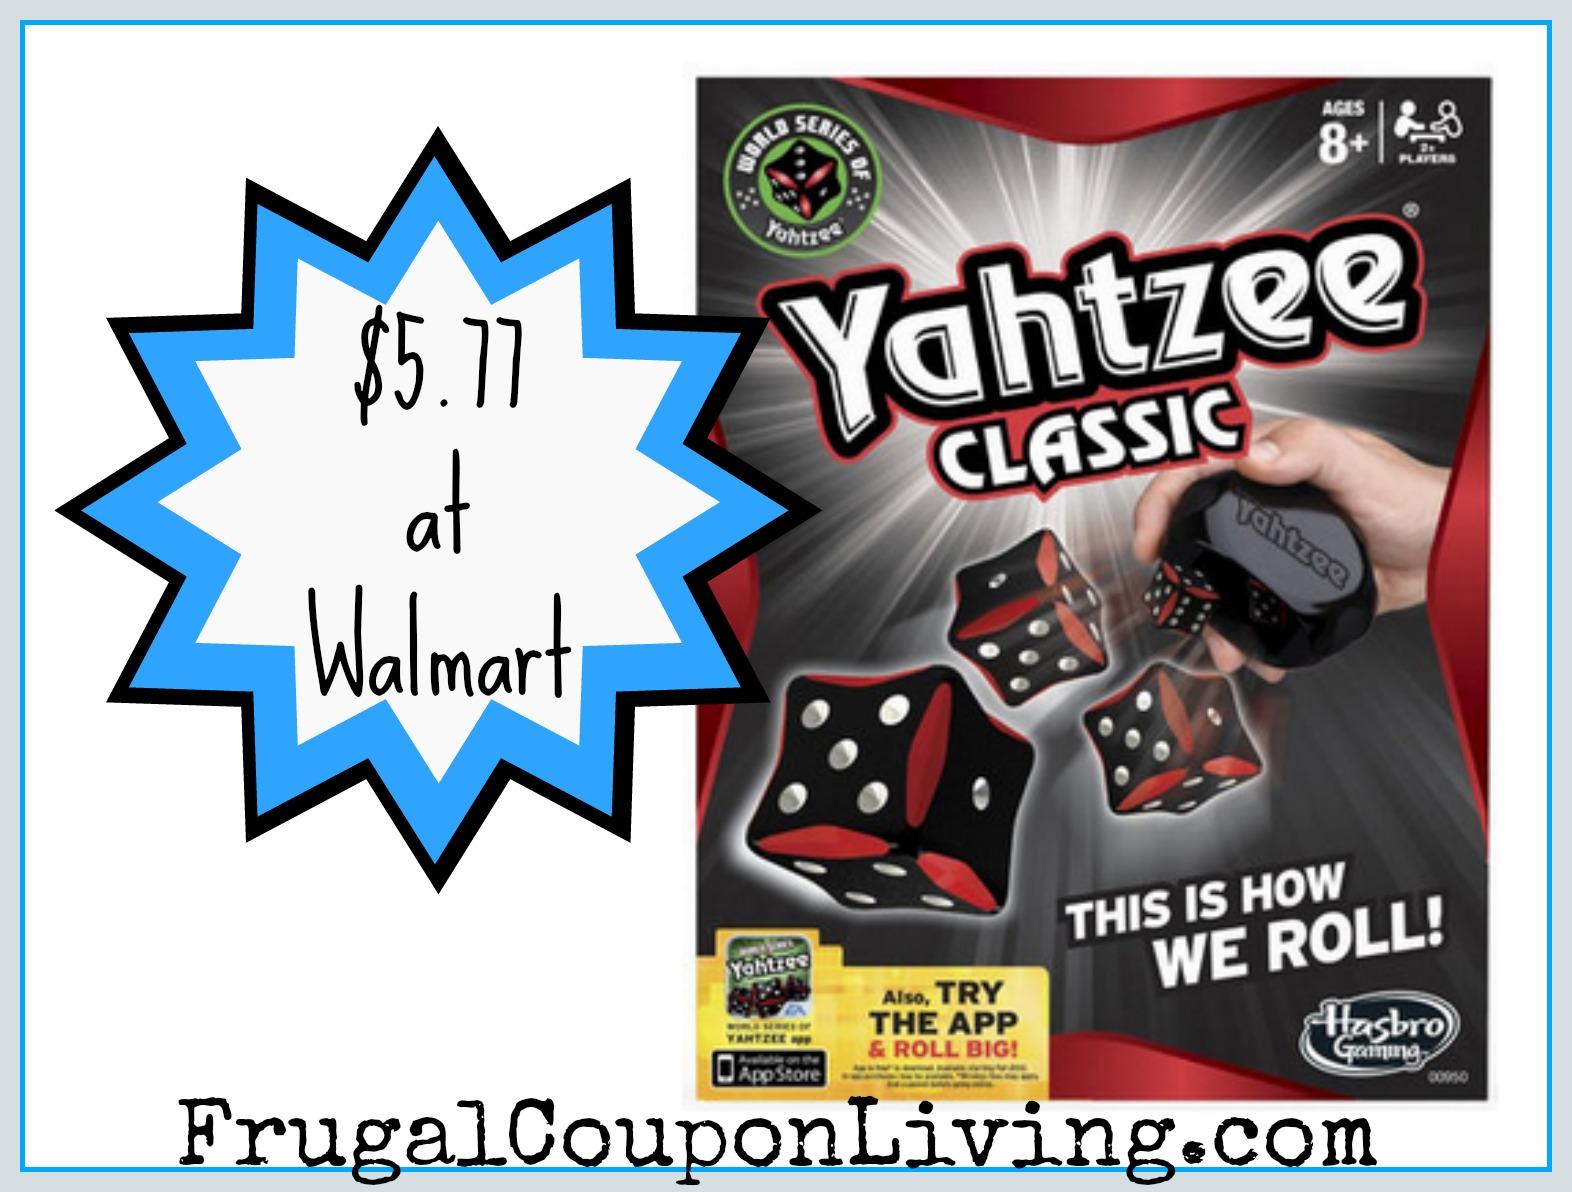 Hasbro Games Coupons Save Over $20 + Yahtzee $5.77 at Walmart